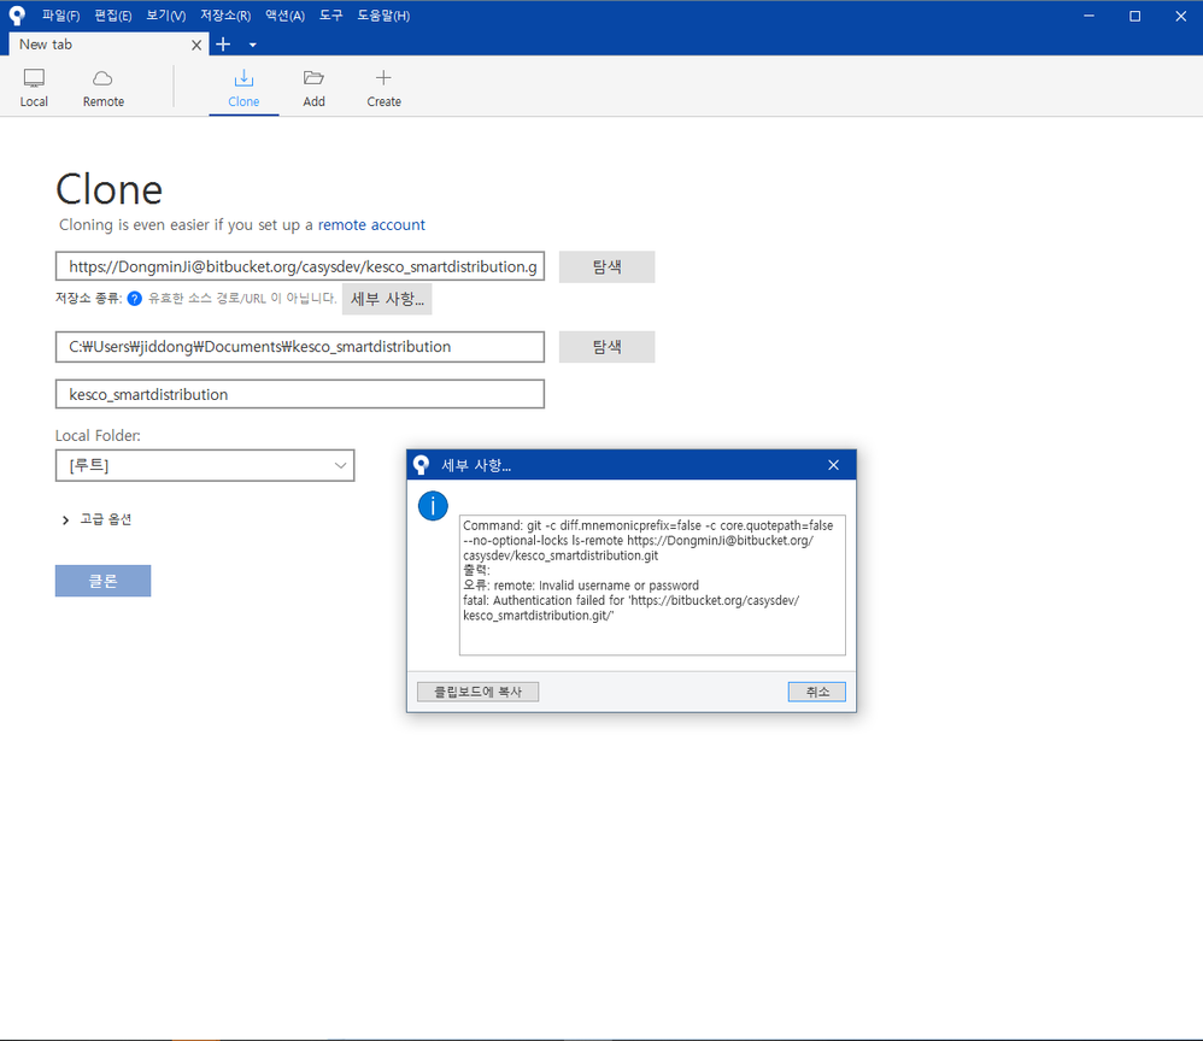 clone_screenshot.png